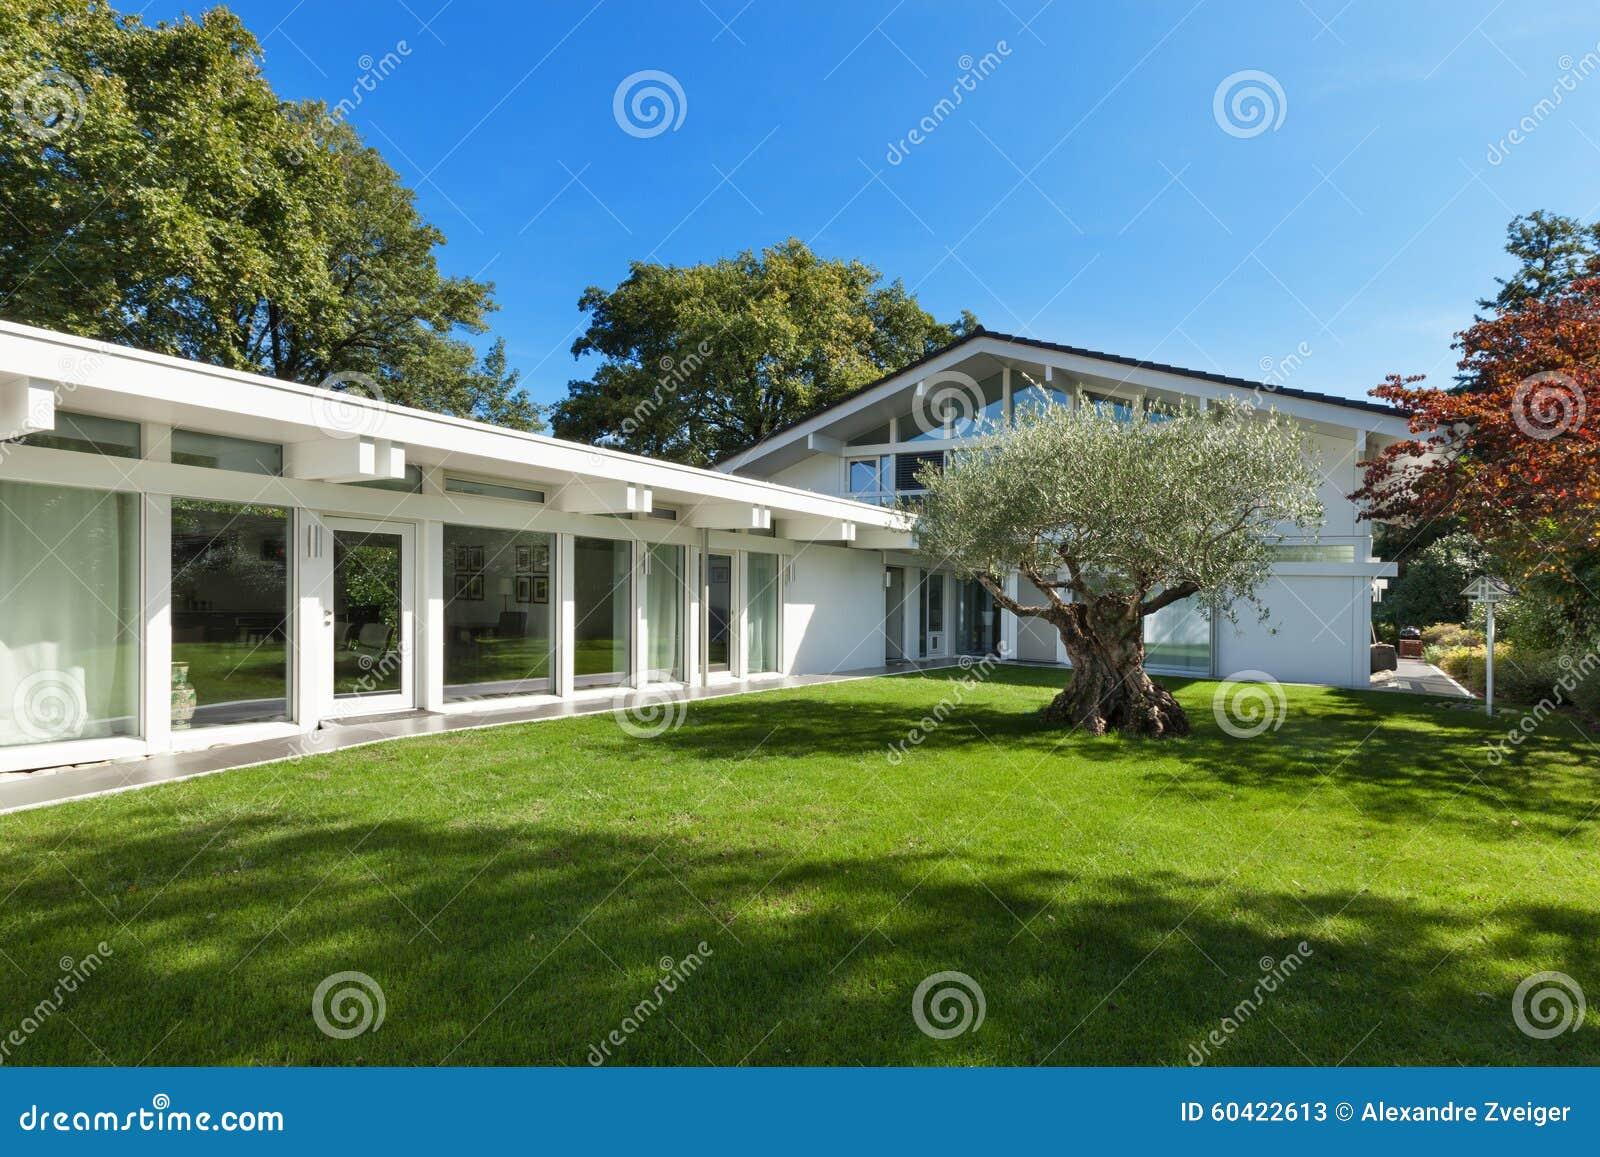 Moden房子的美丽的庭院